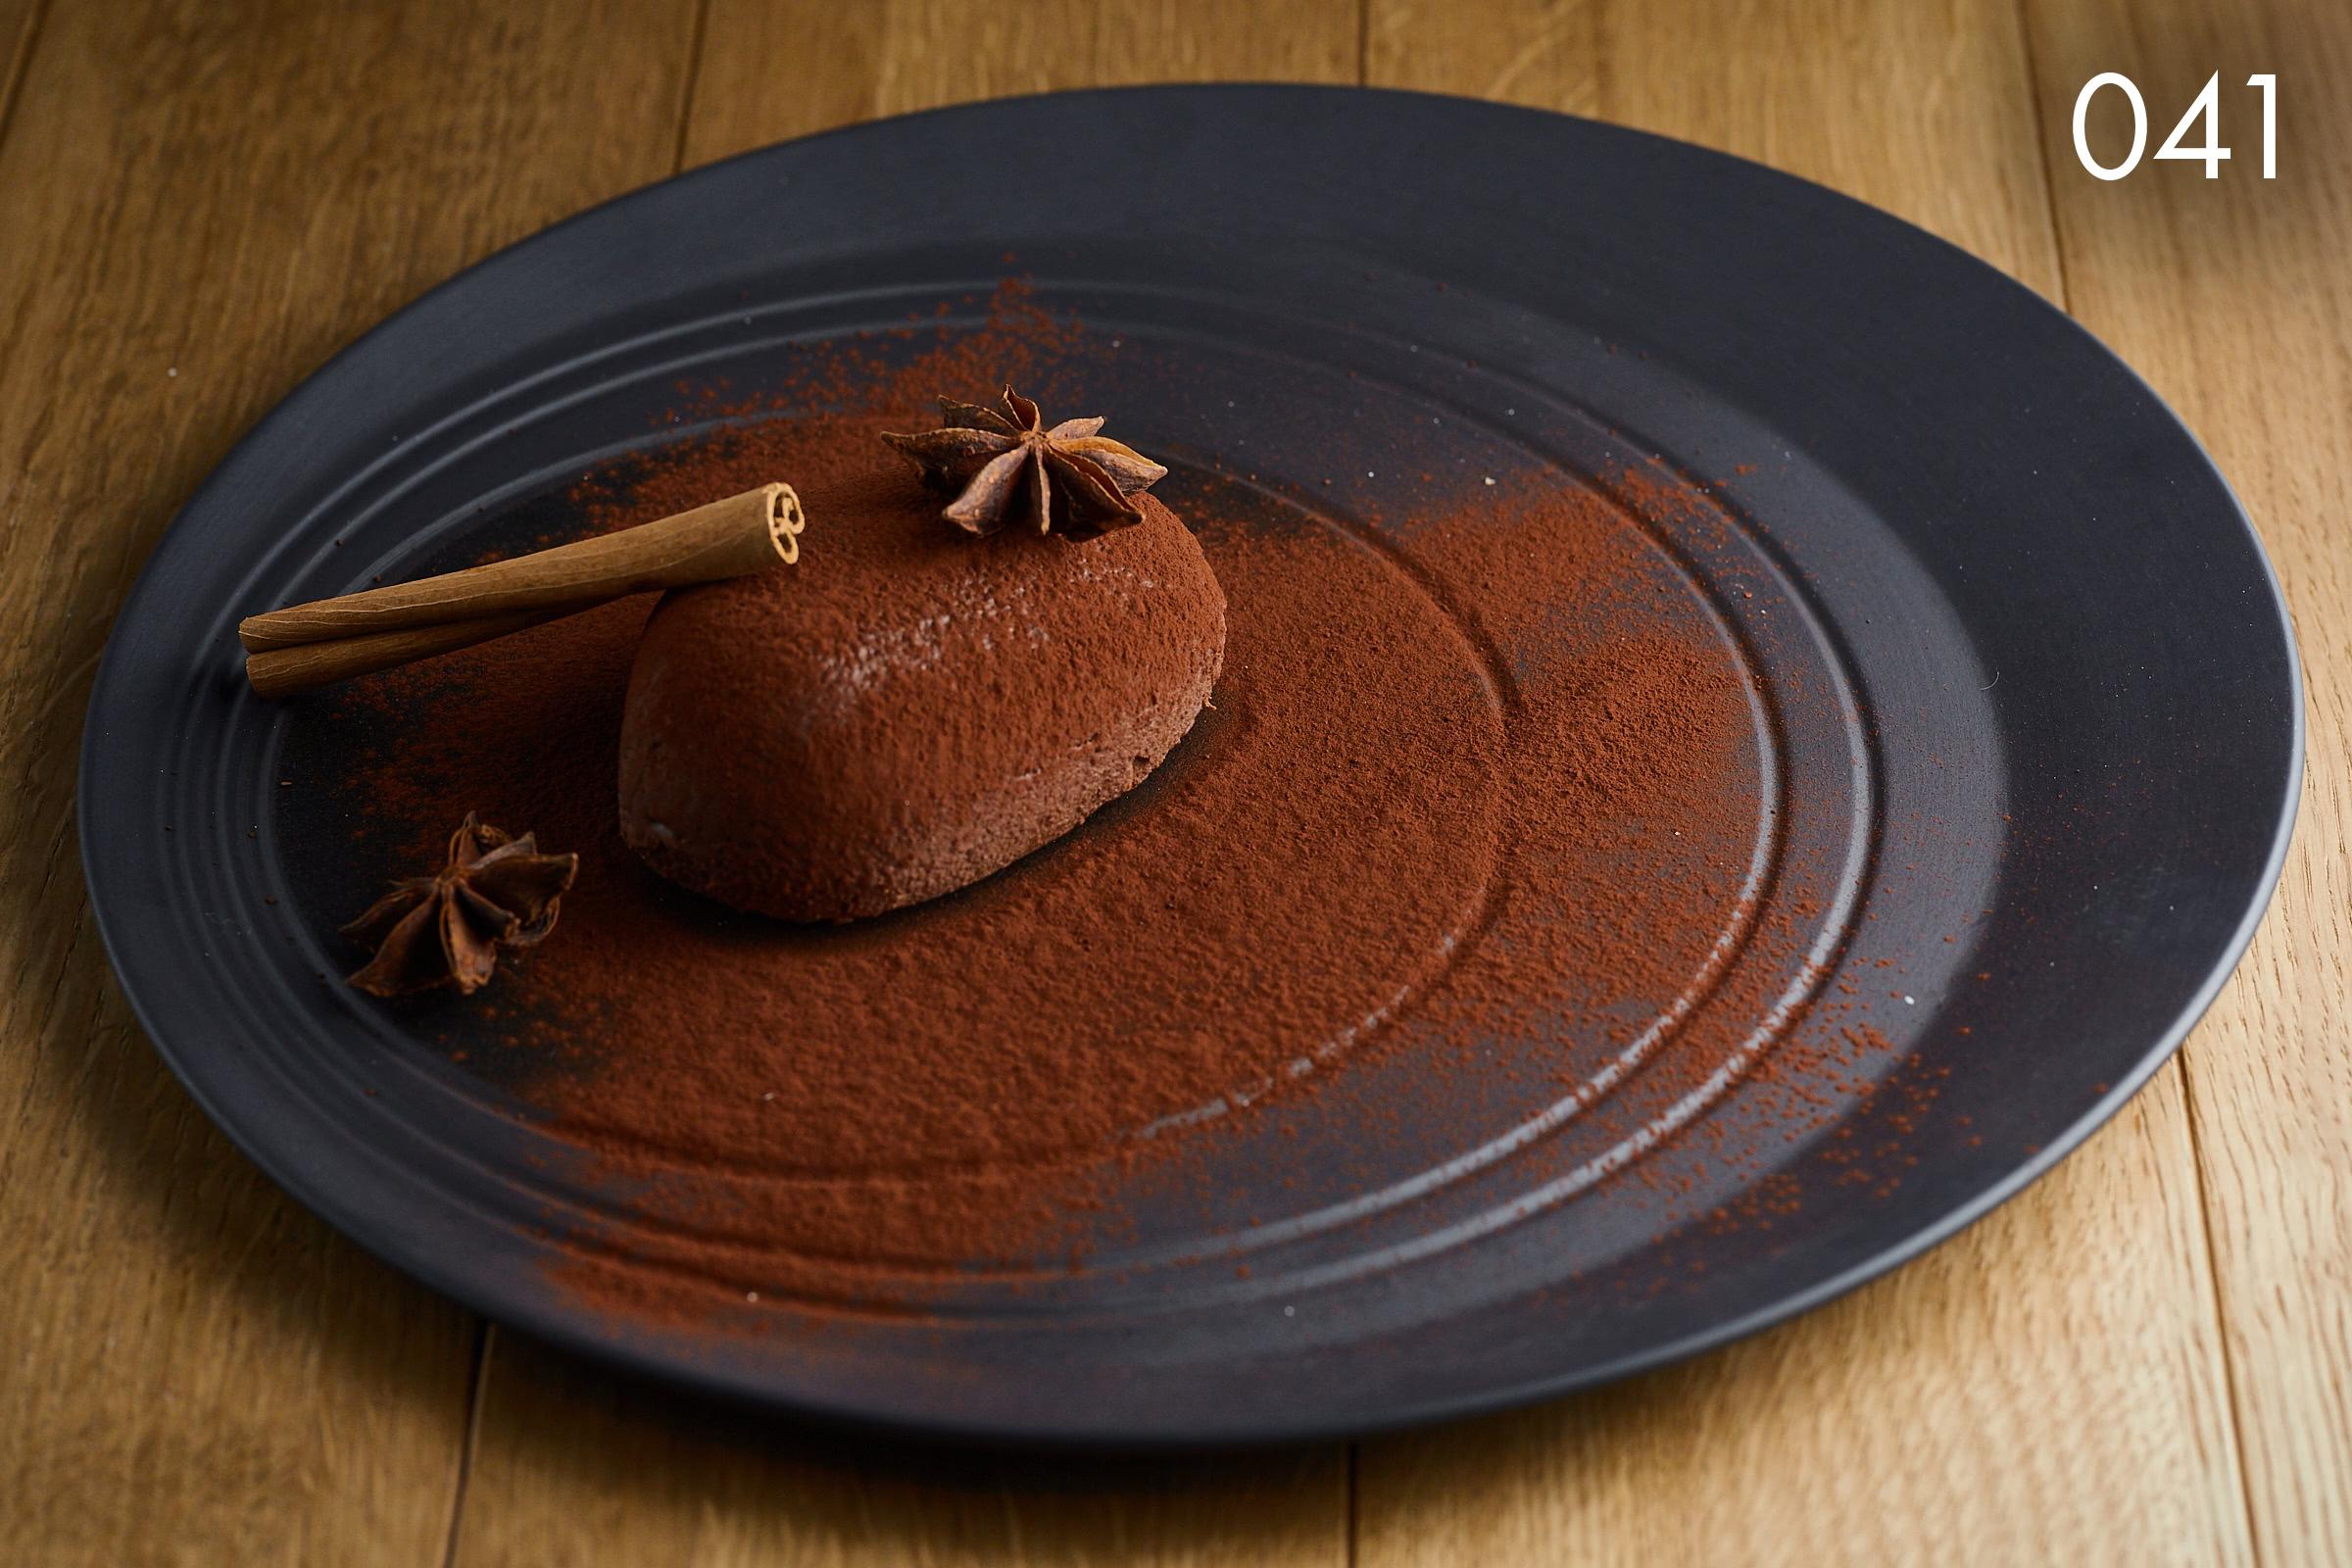 каталонский десерт в ресторане Веранда